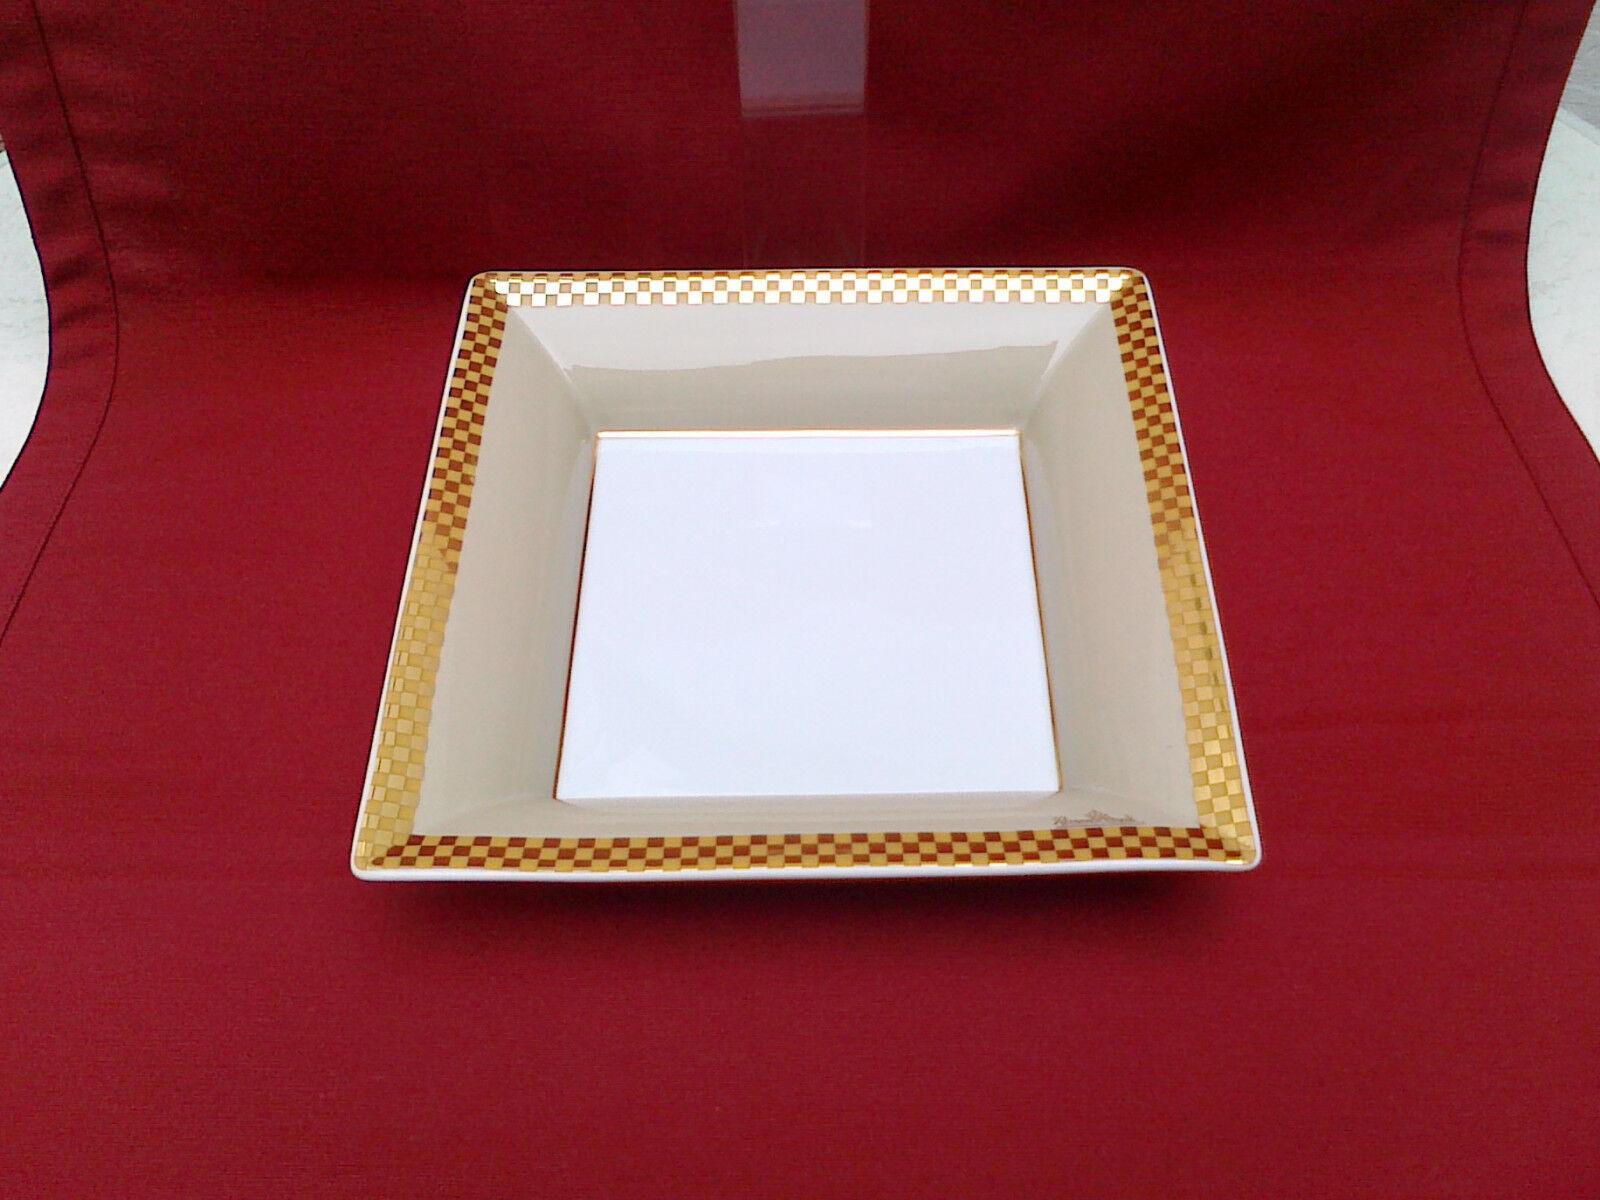 Rosenthal Classic-Porcelaine-Bol 18x18 cm design Shiraz IVORY-Neuf